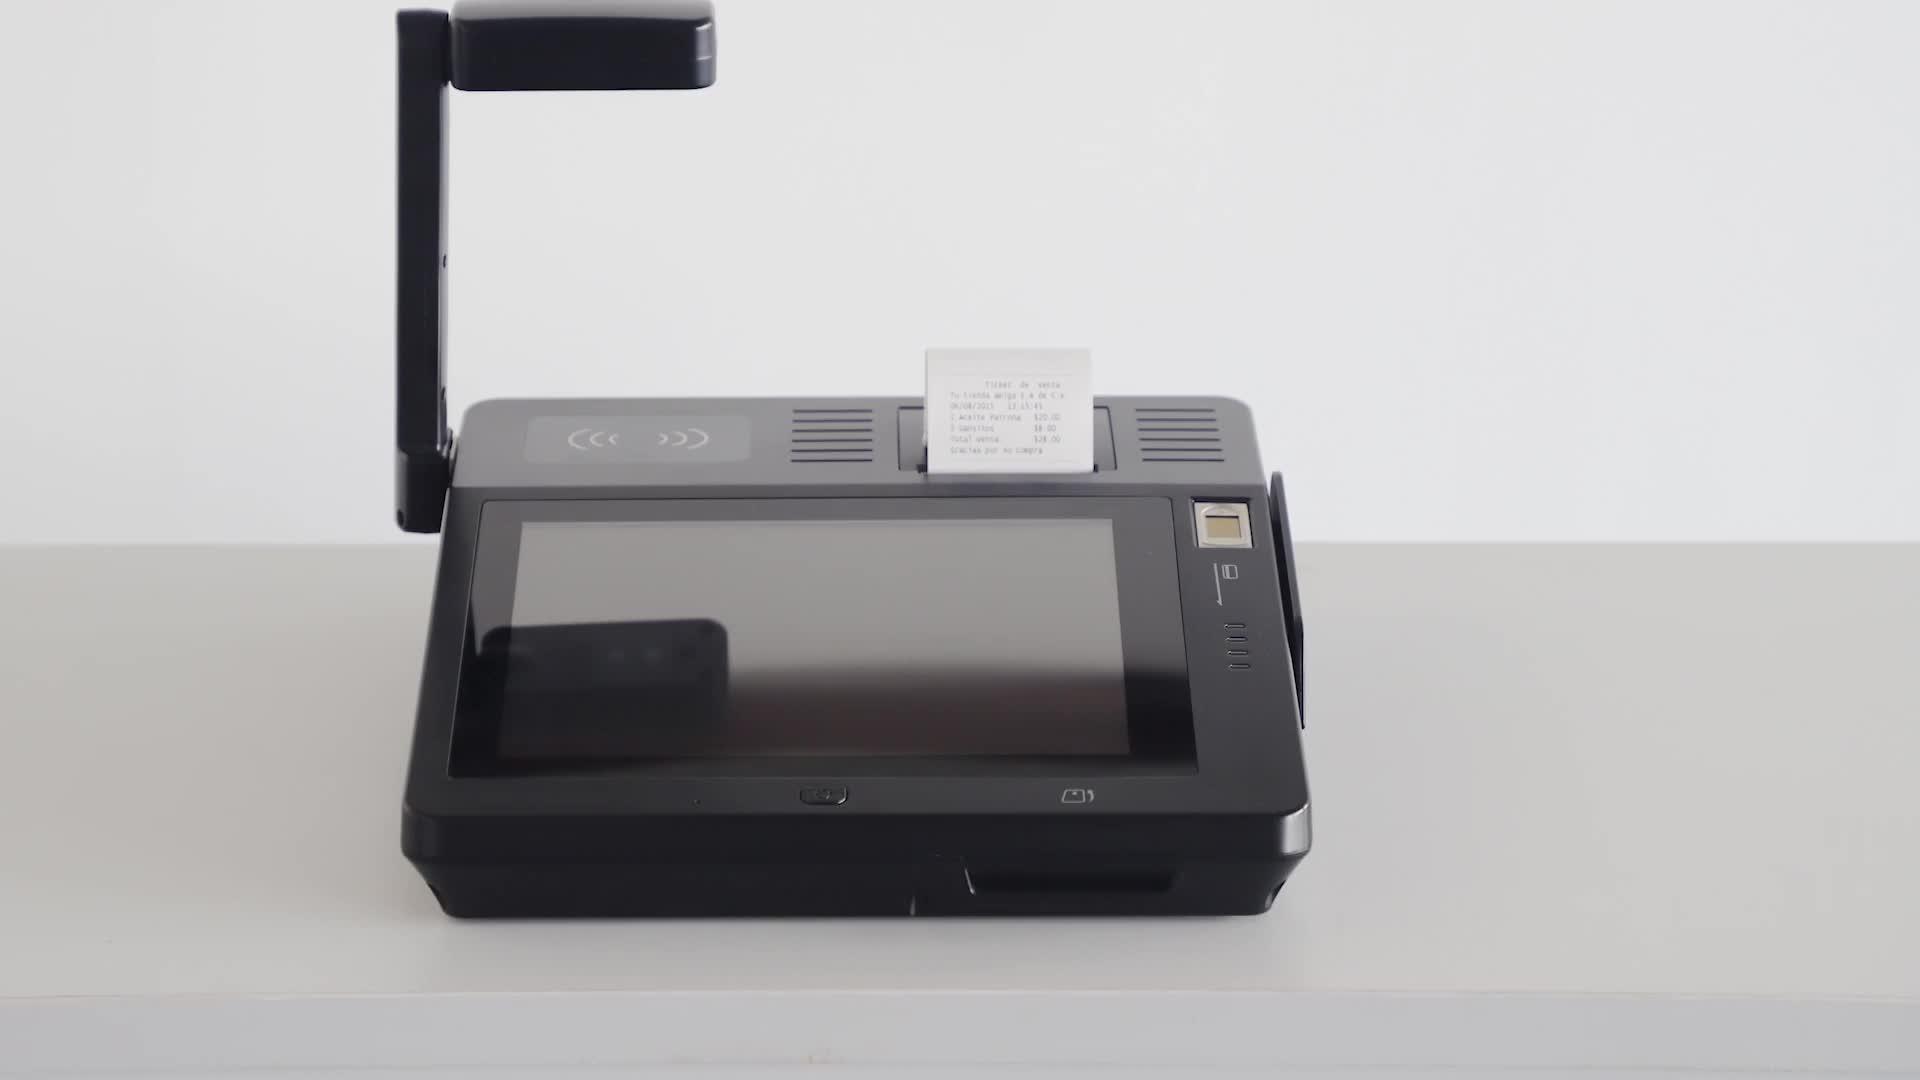 Jepower 3G 4G Wifi Fingerprint NFC IC Card Reader Printer Android POS